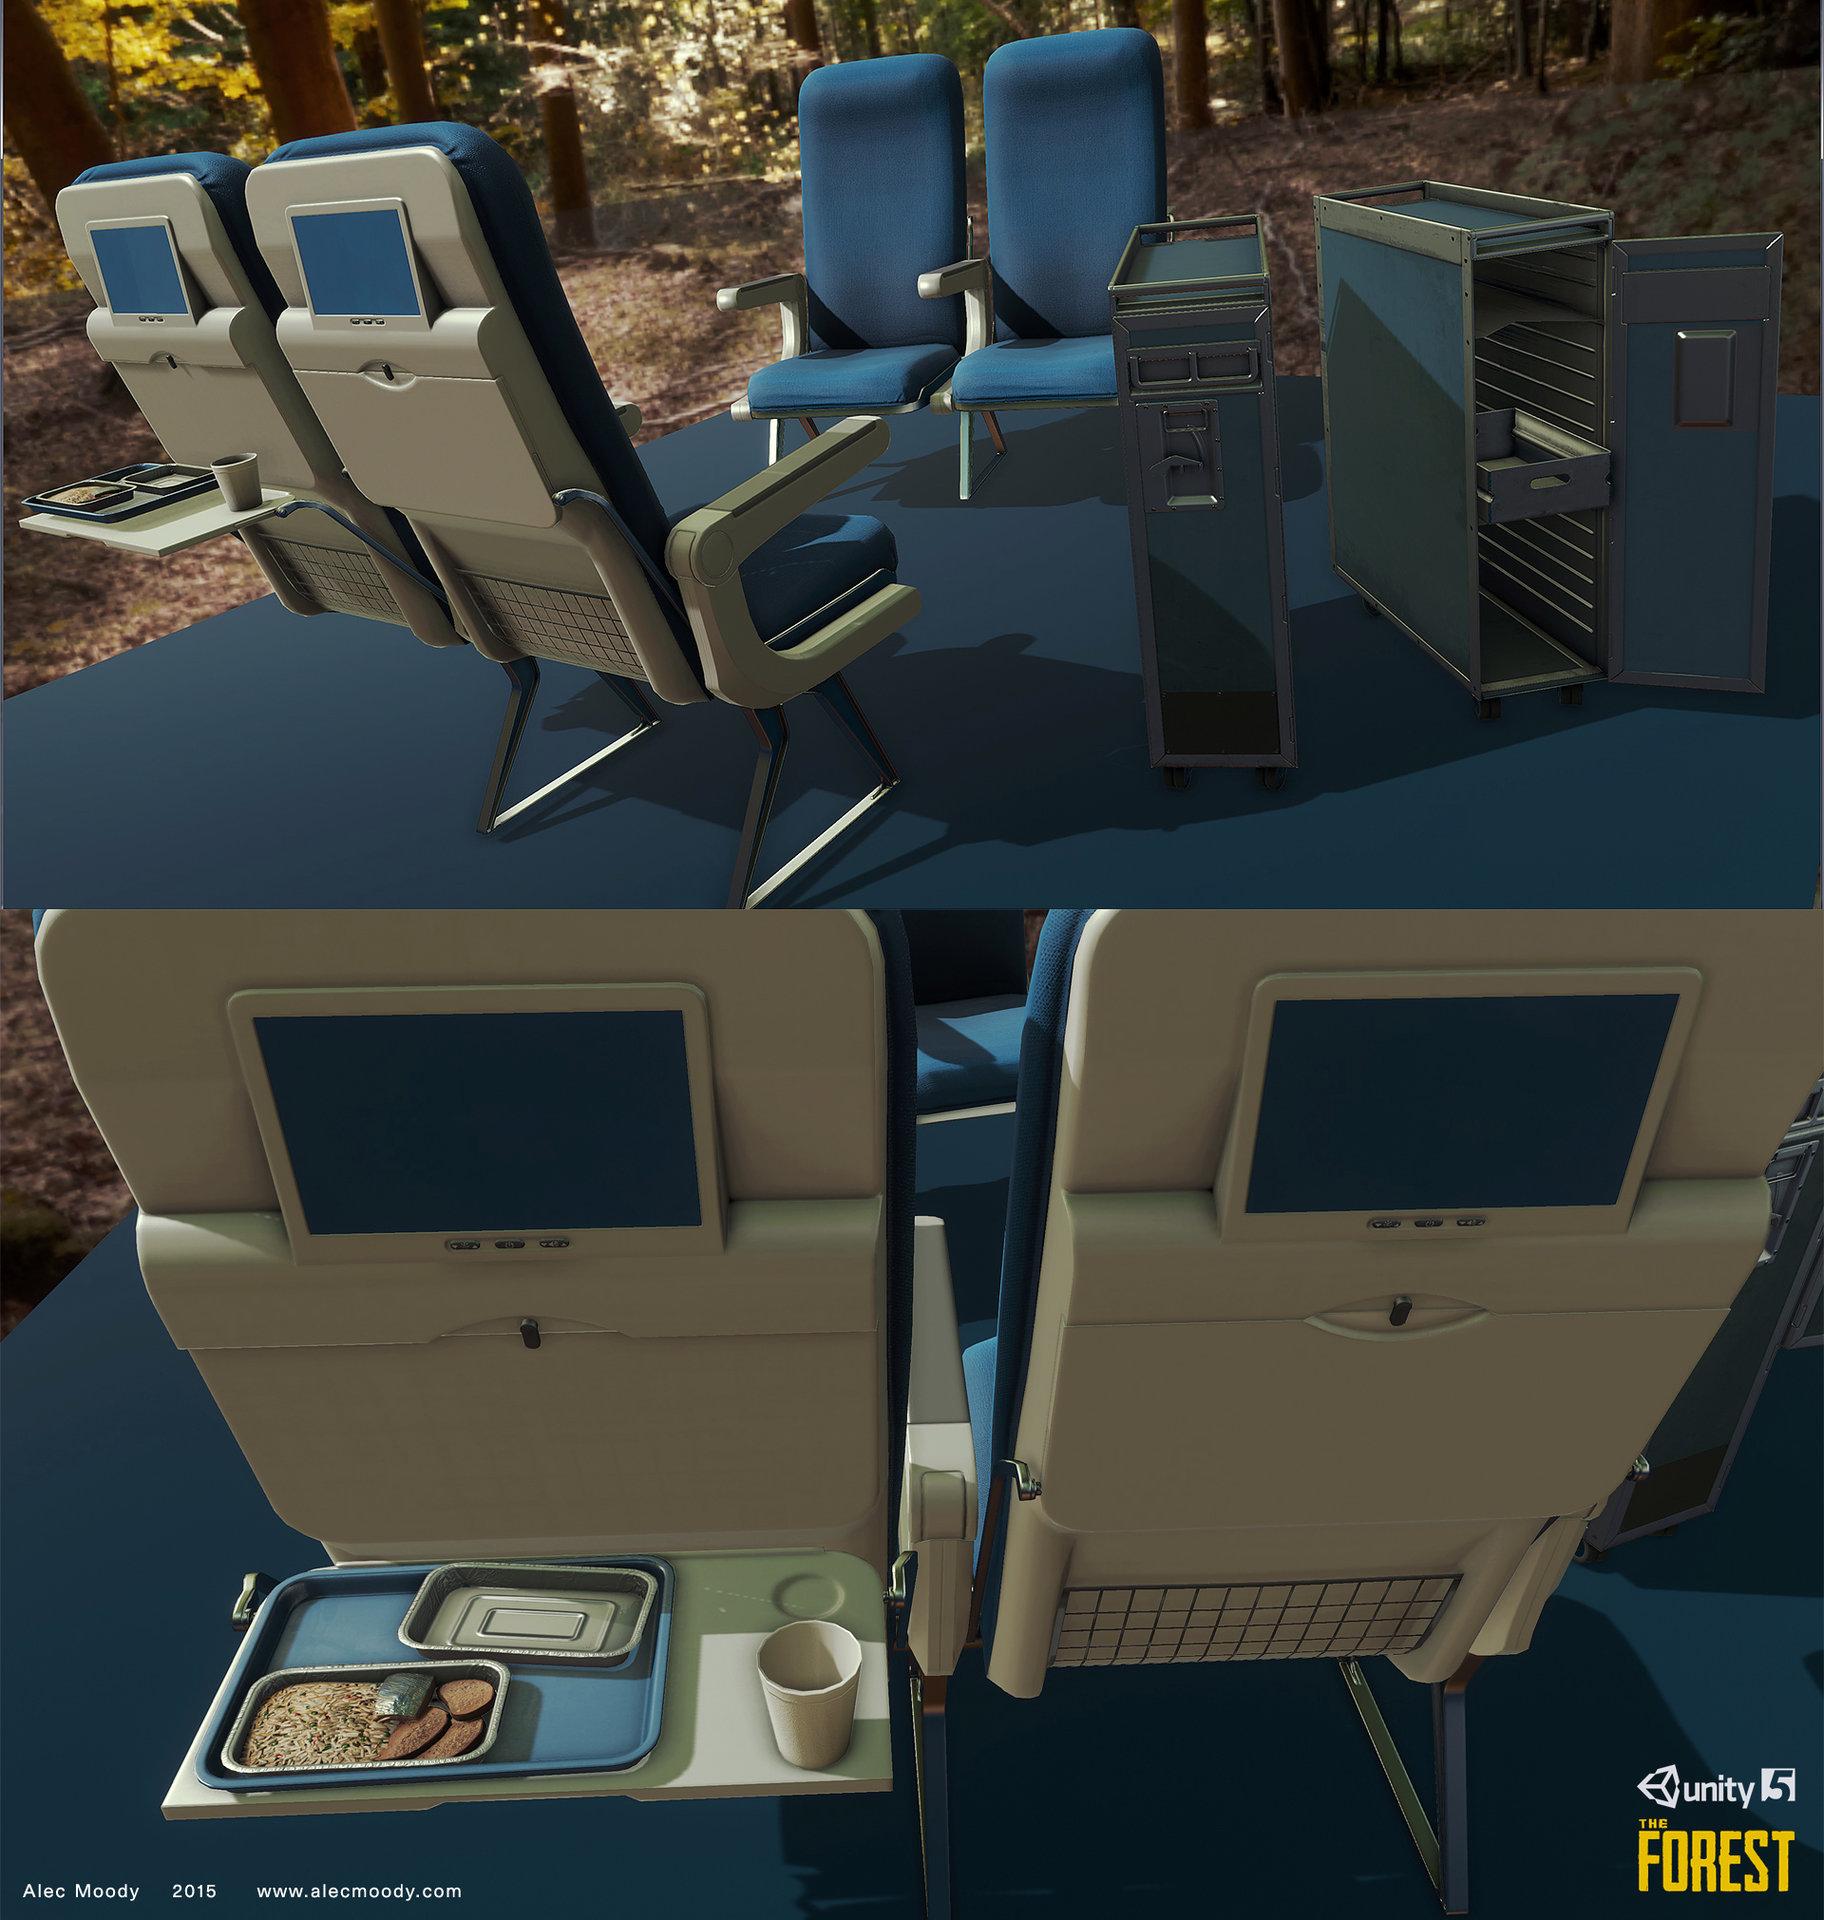 alec-moody-seatsprops.jpg